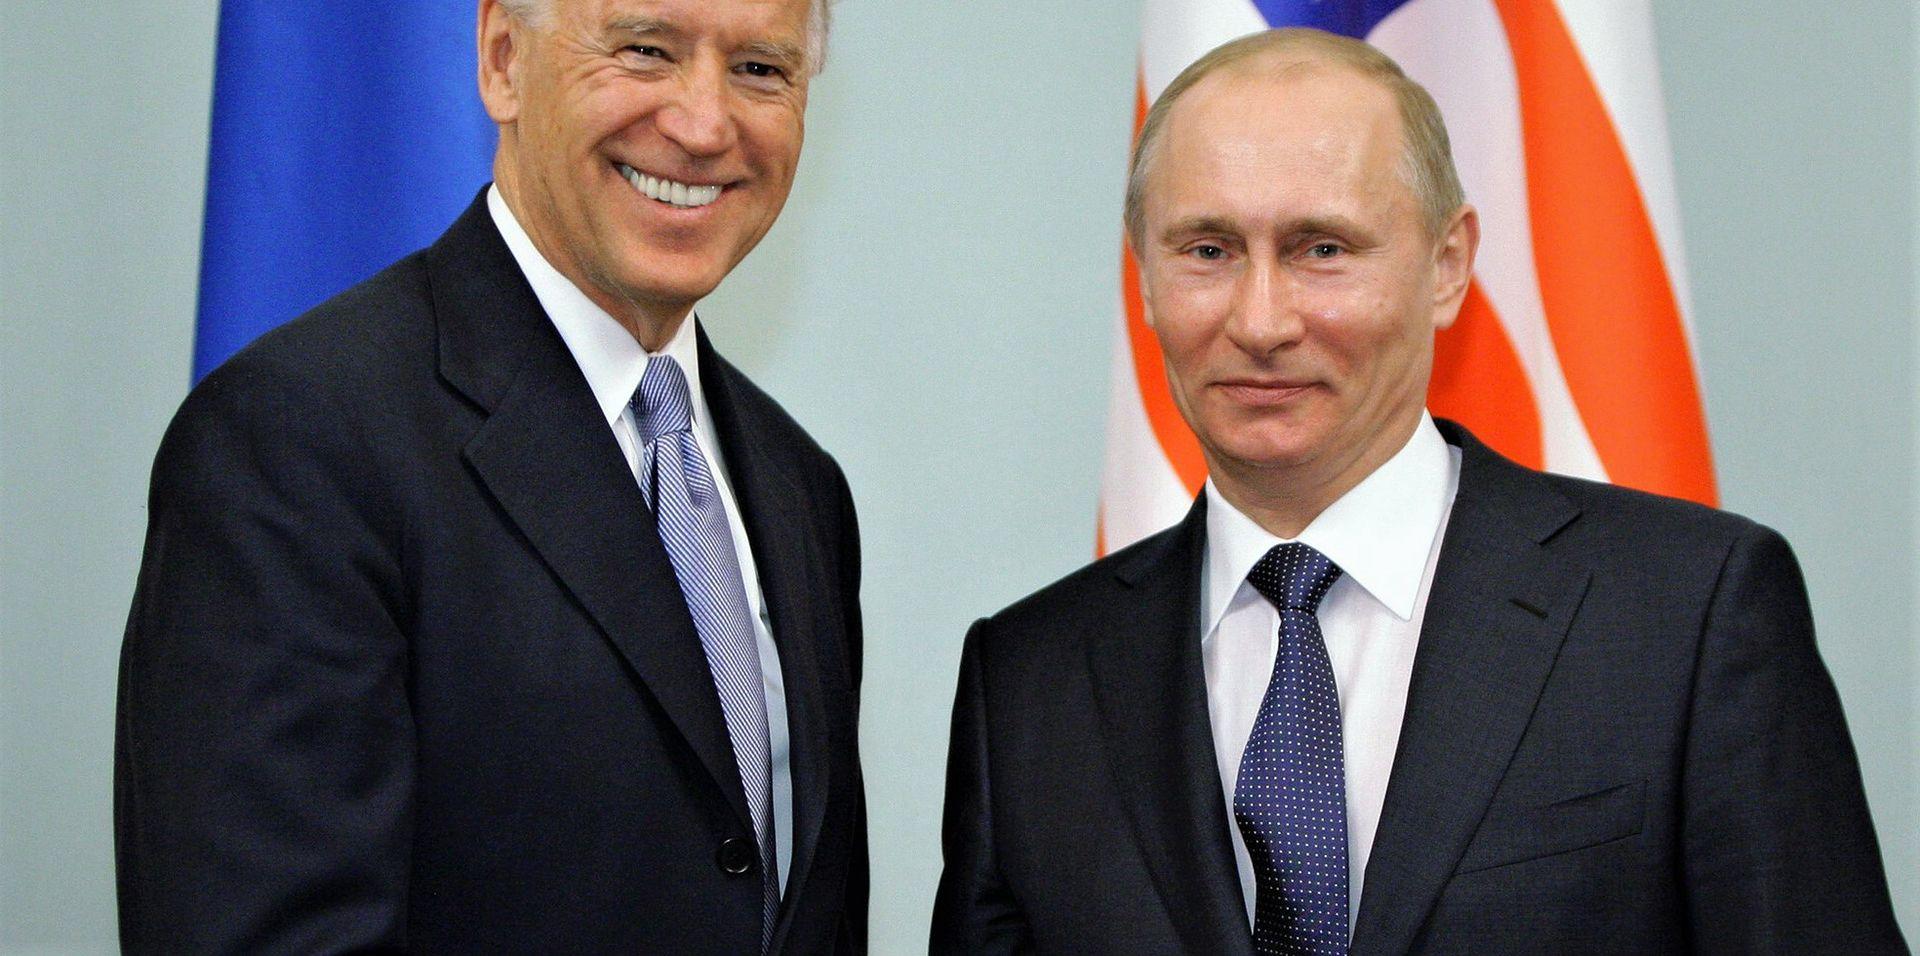 Joe Biden i Władimir Putin, 10 marca 2011 r.